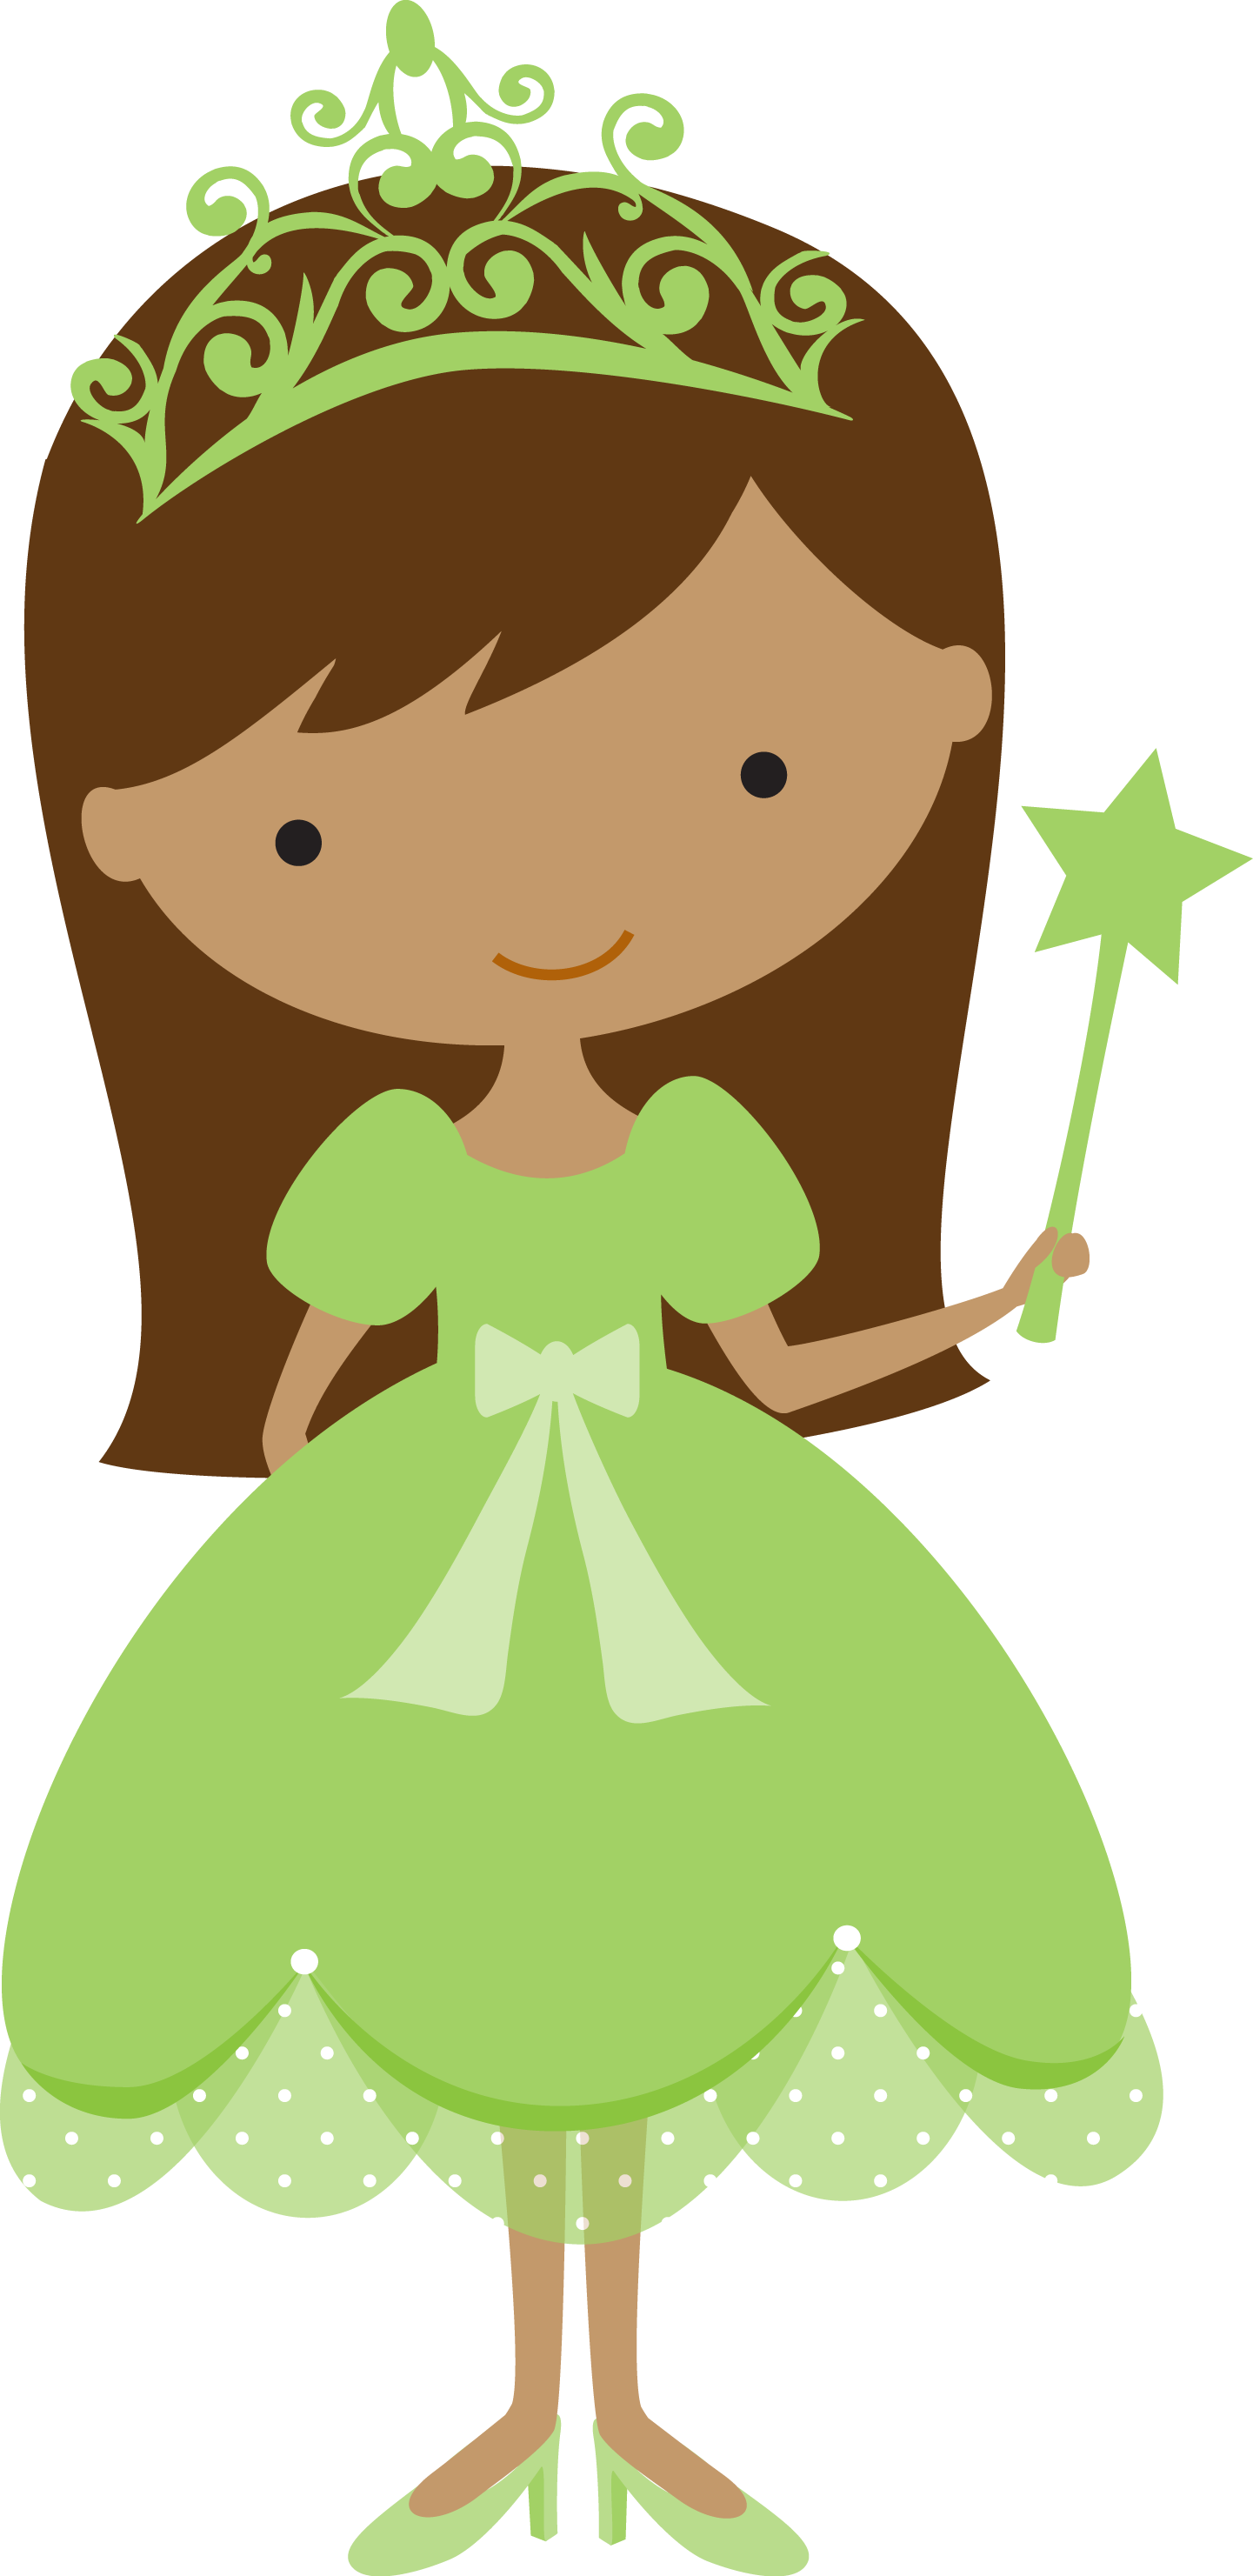 Princesas e fadas 2 - green2.png - Minus | Princesas | Pinterest